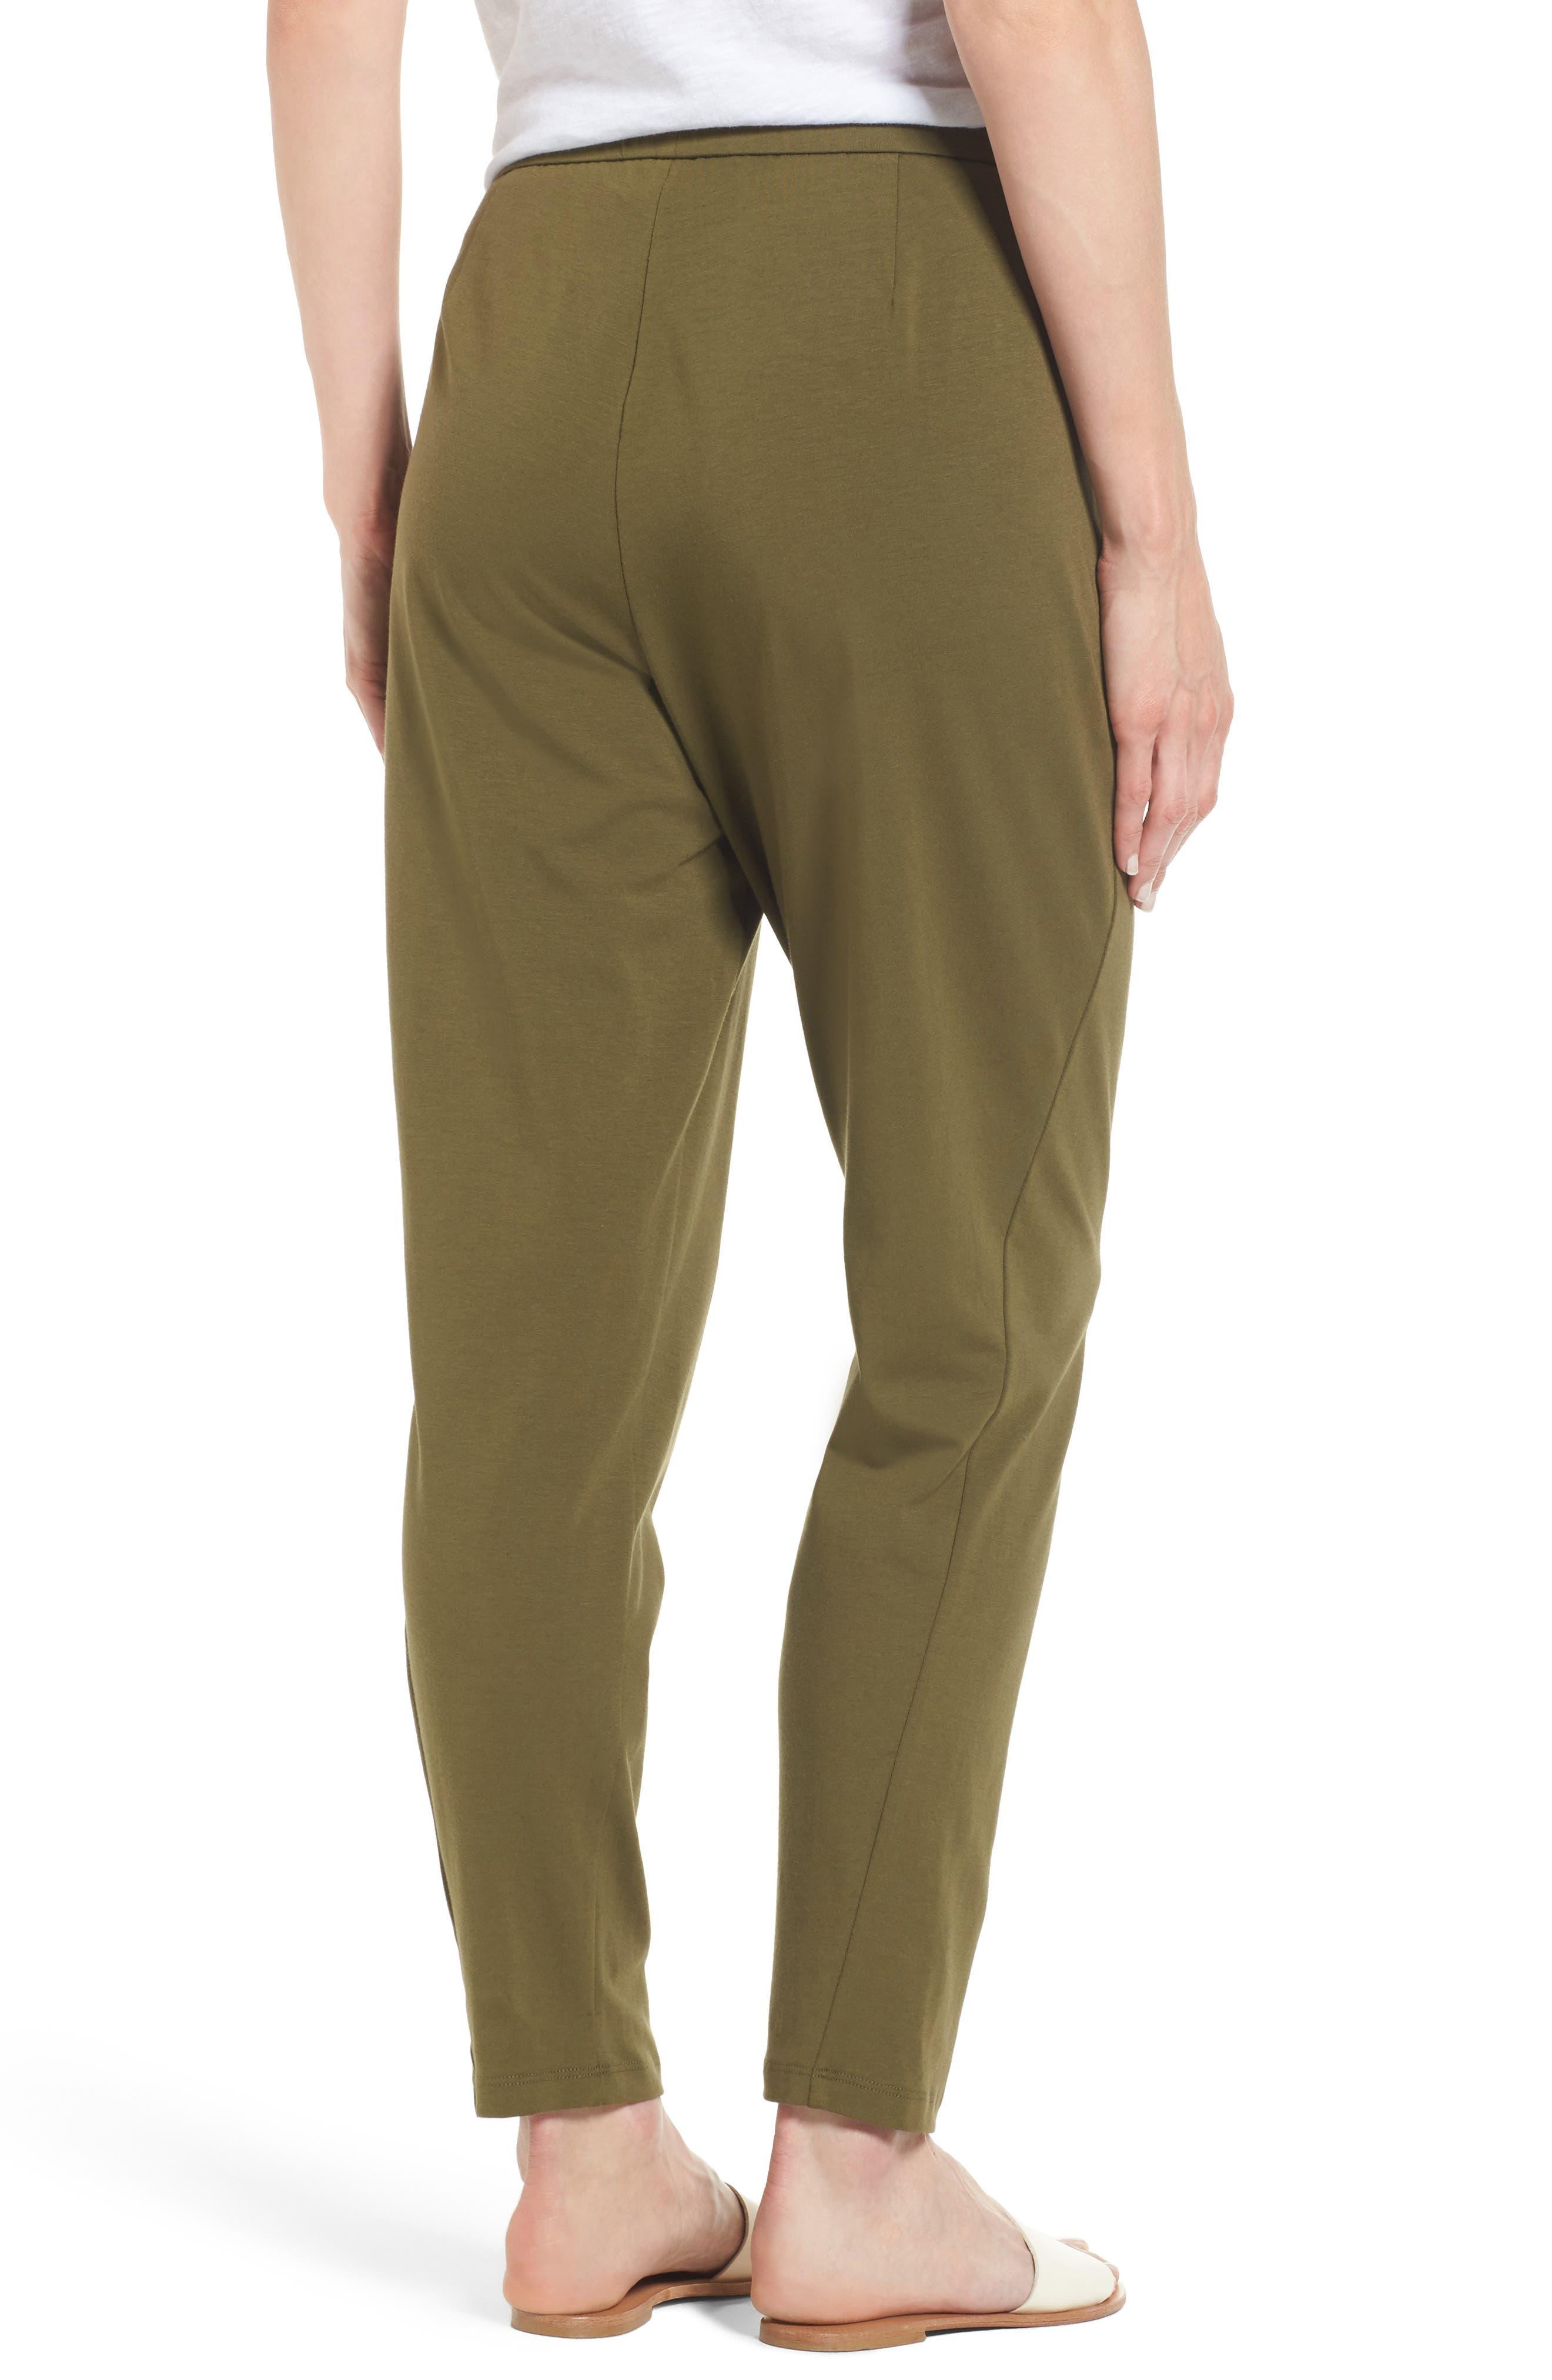 Alternate Image 2  - Eileen Fisher Stretch Organic Cotton Slim Slouchy Ankle Pants (Regular & Petite)